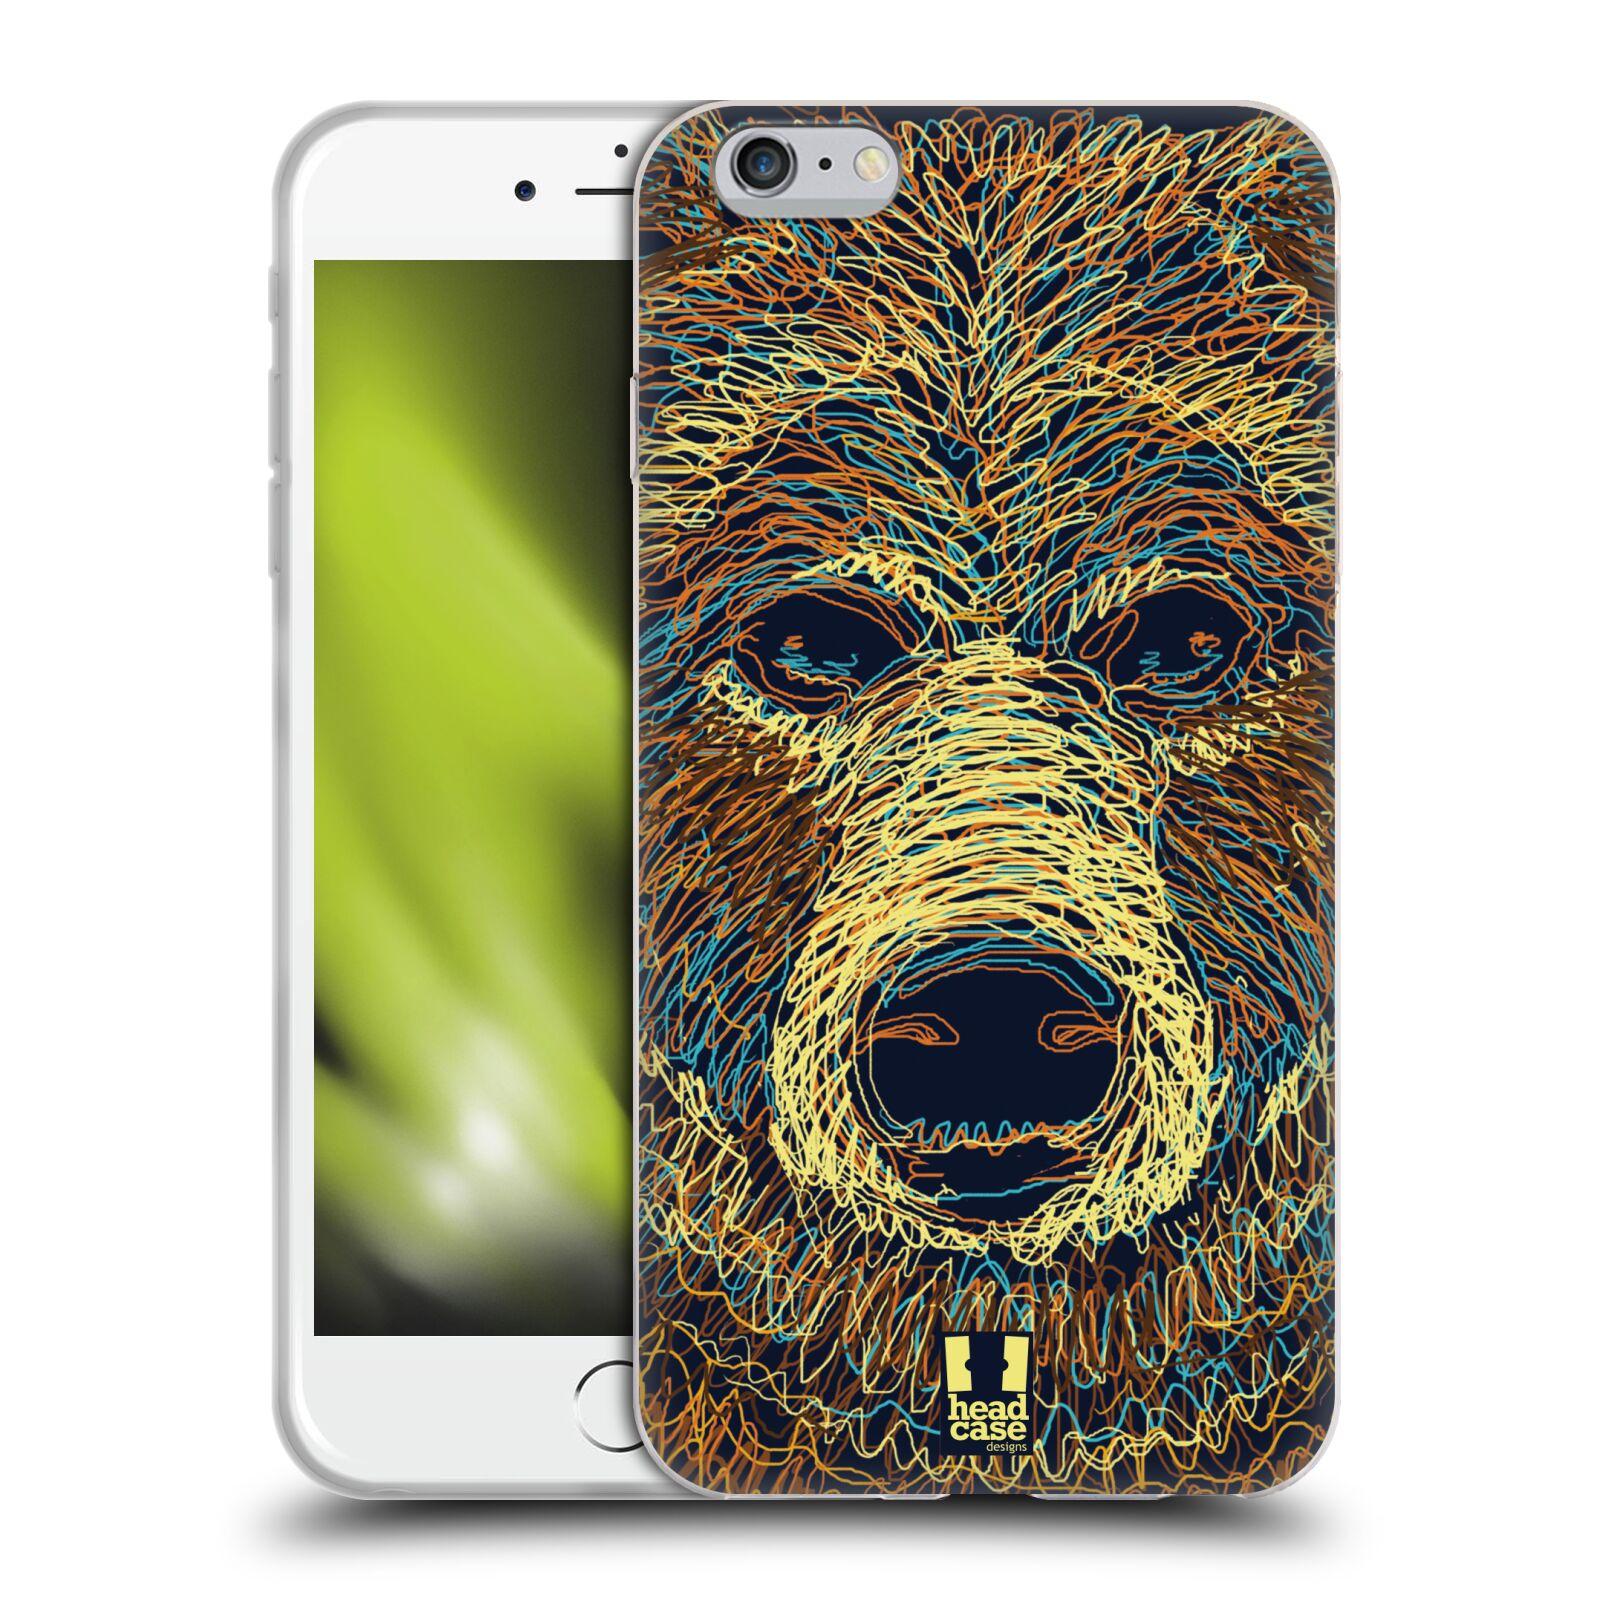 HEAD CASE silikonový obal na mobil Apple Iphone 6 PLUS/ 6S PLUS vzor zvíře čmáranice medvěd